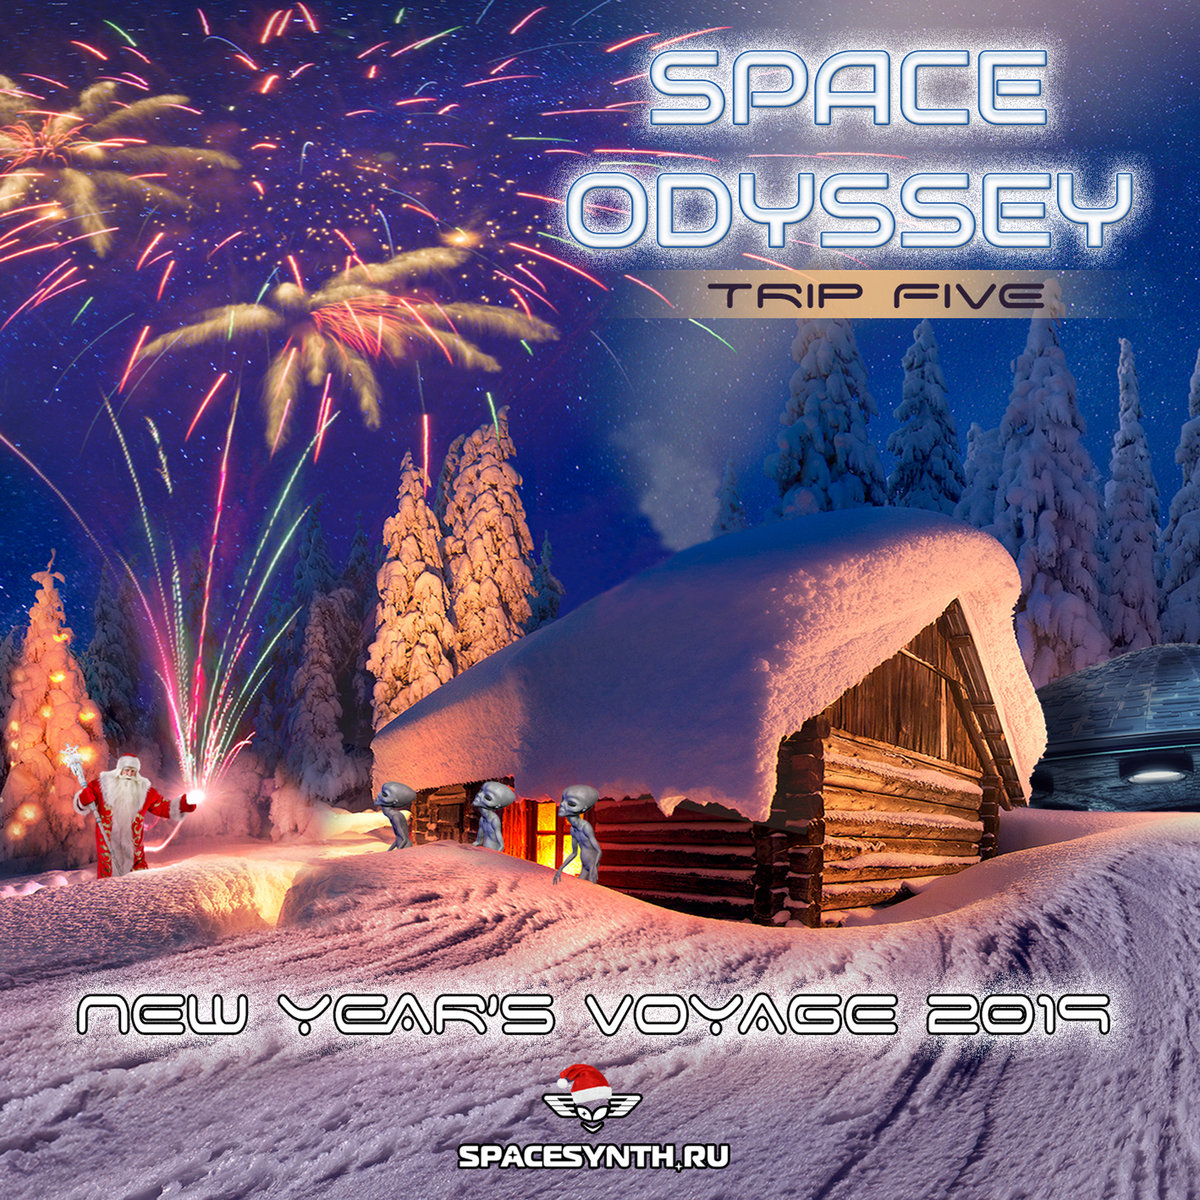 5b3b0d6c95 Space Odyssey – Trip Five: New Year's Voyage 2019 | Spacesynth.ru